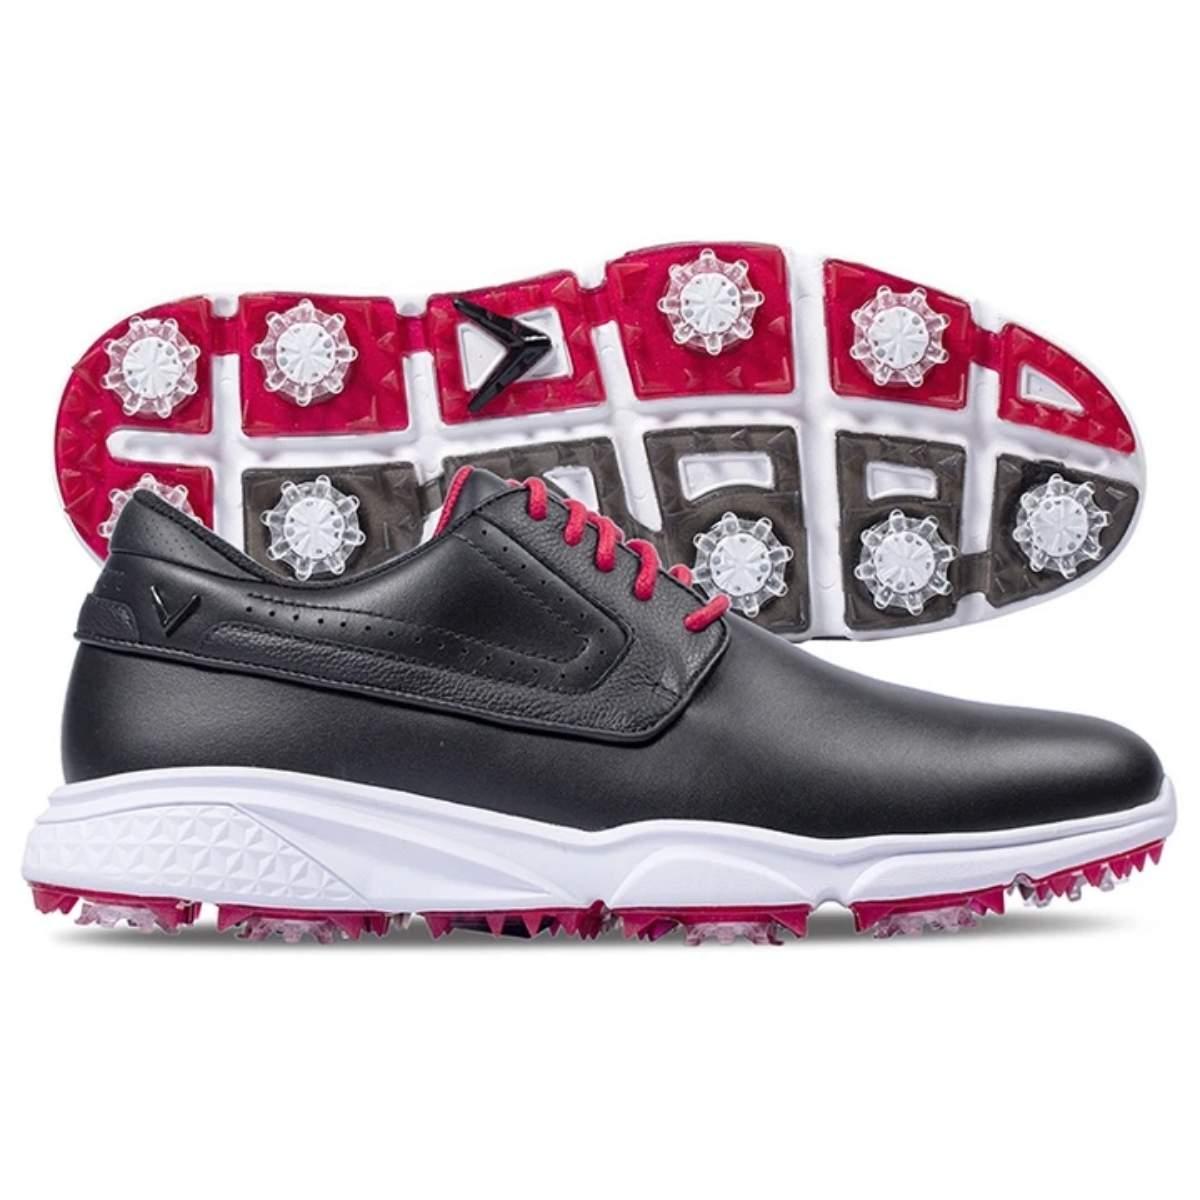 Callaway Men's Coronado V2 LX Golf Shoe - Black